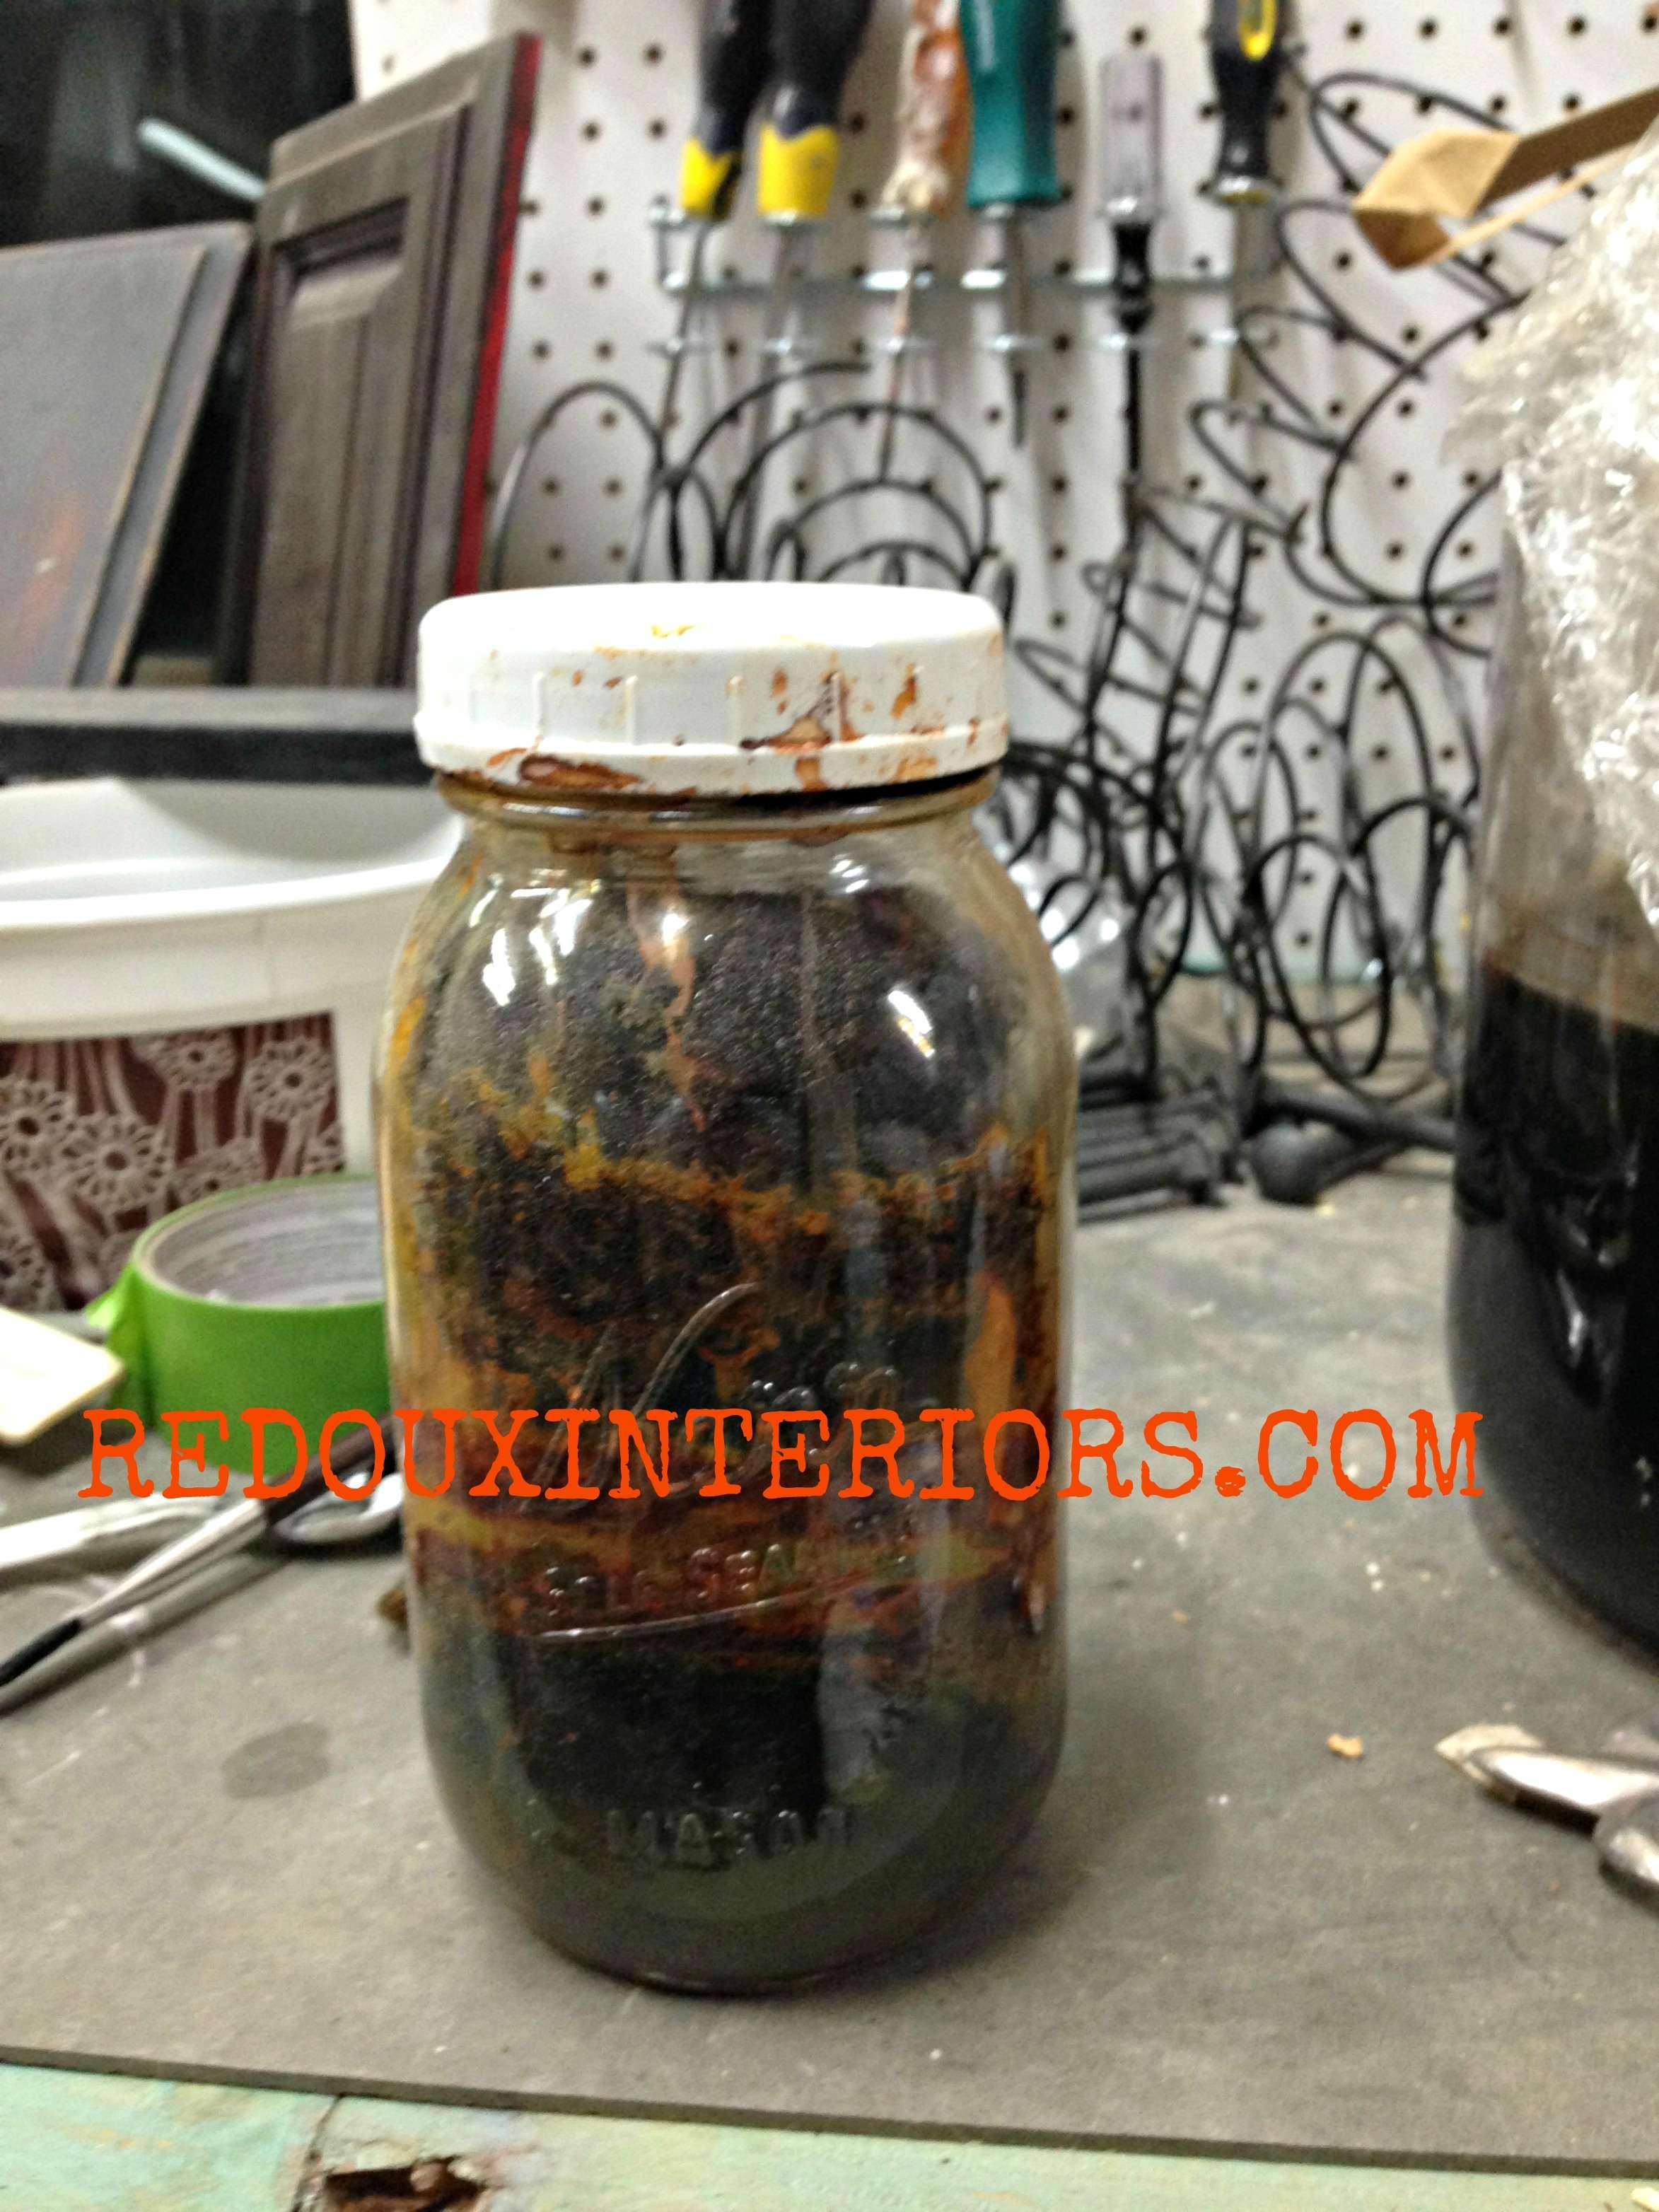 Pickling Liquid Redouxinteriors